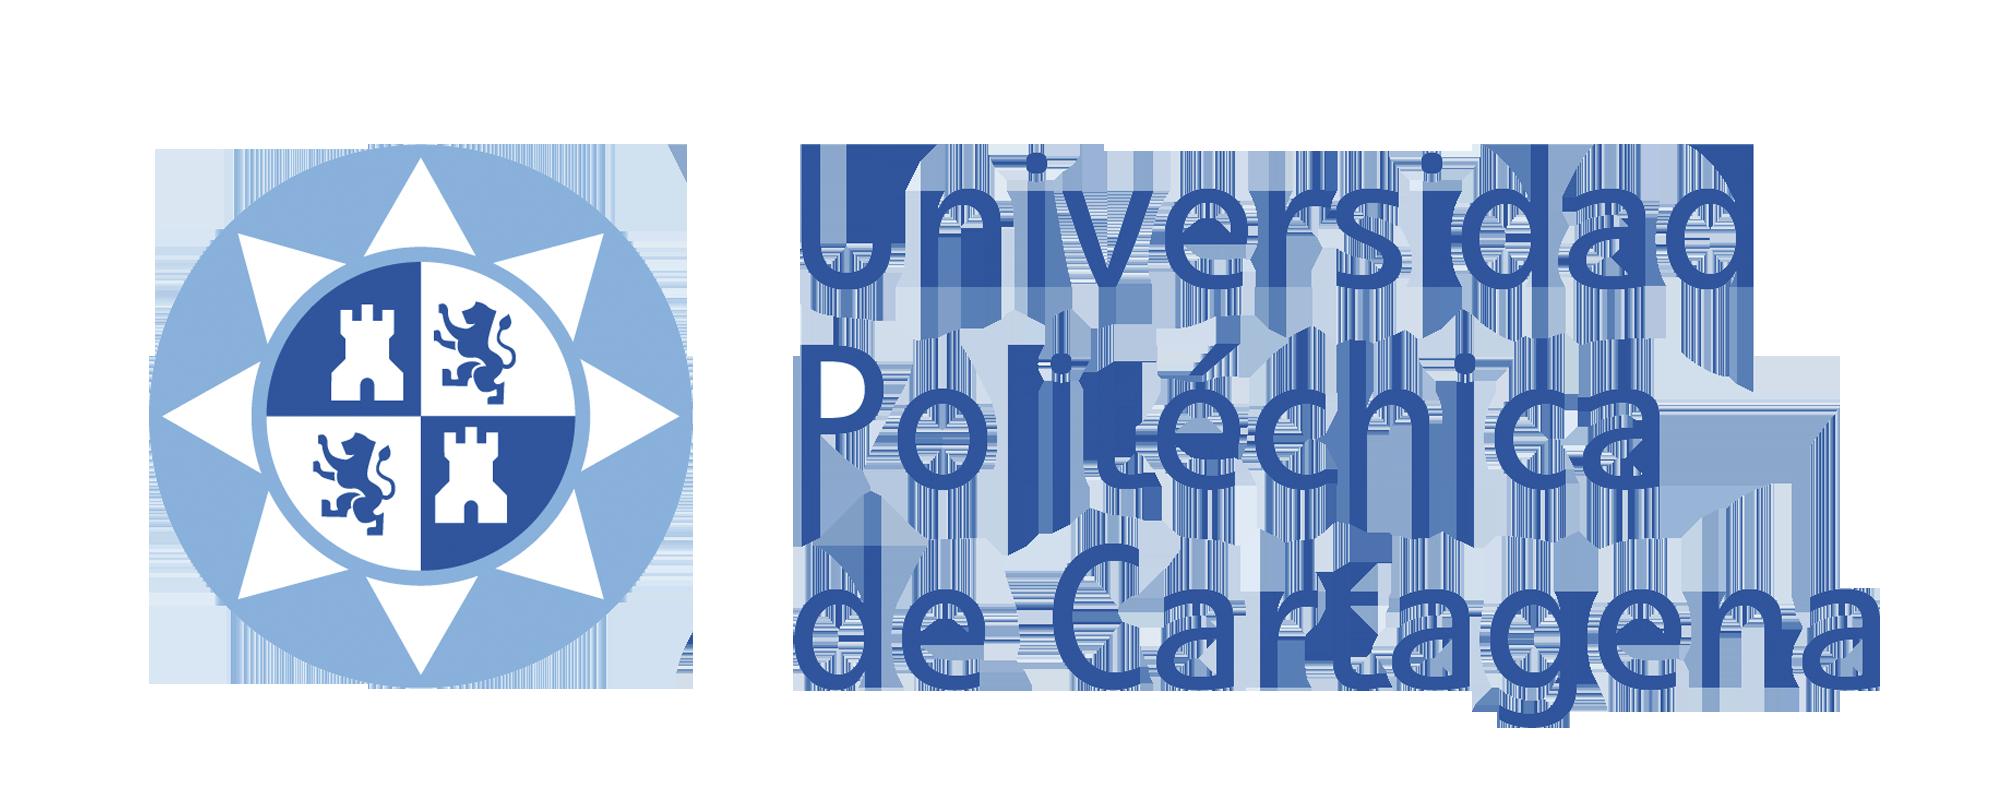 logo_upct.png